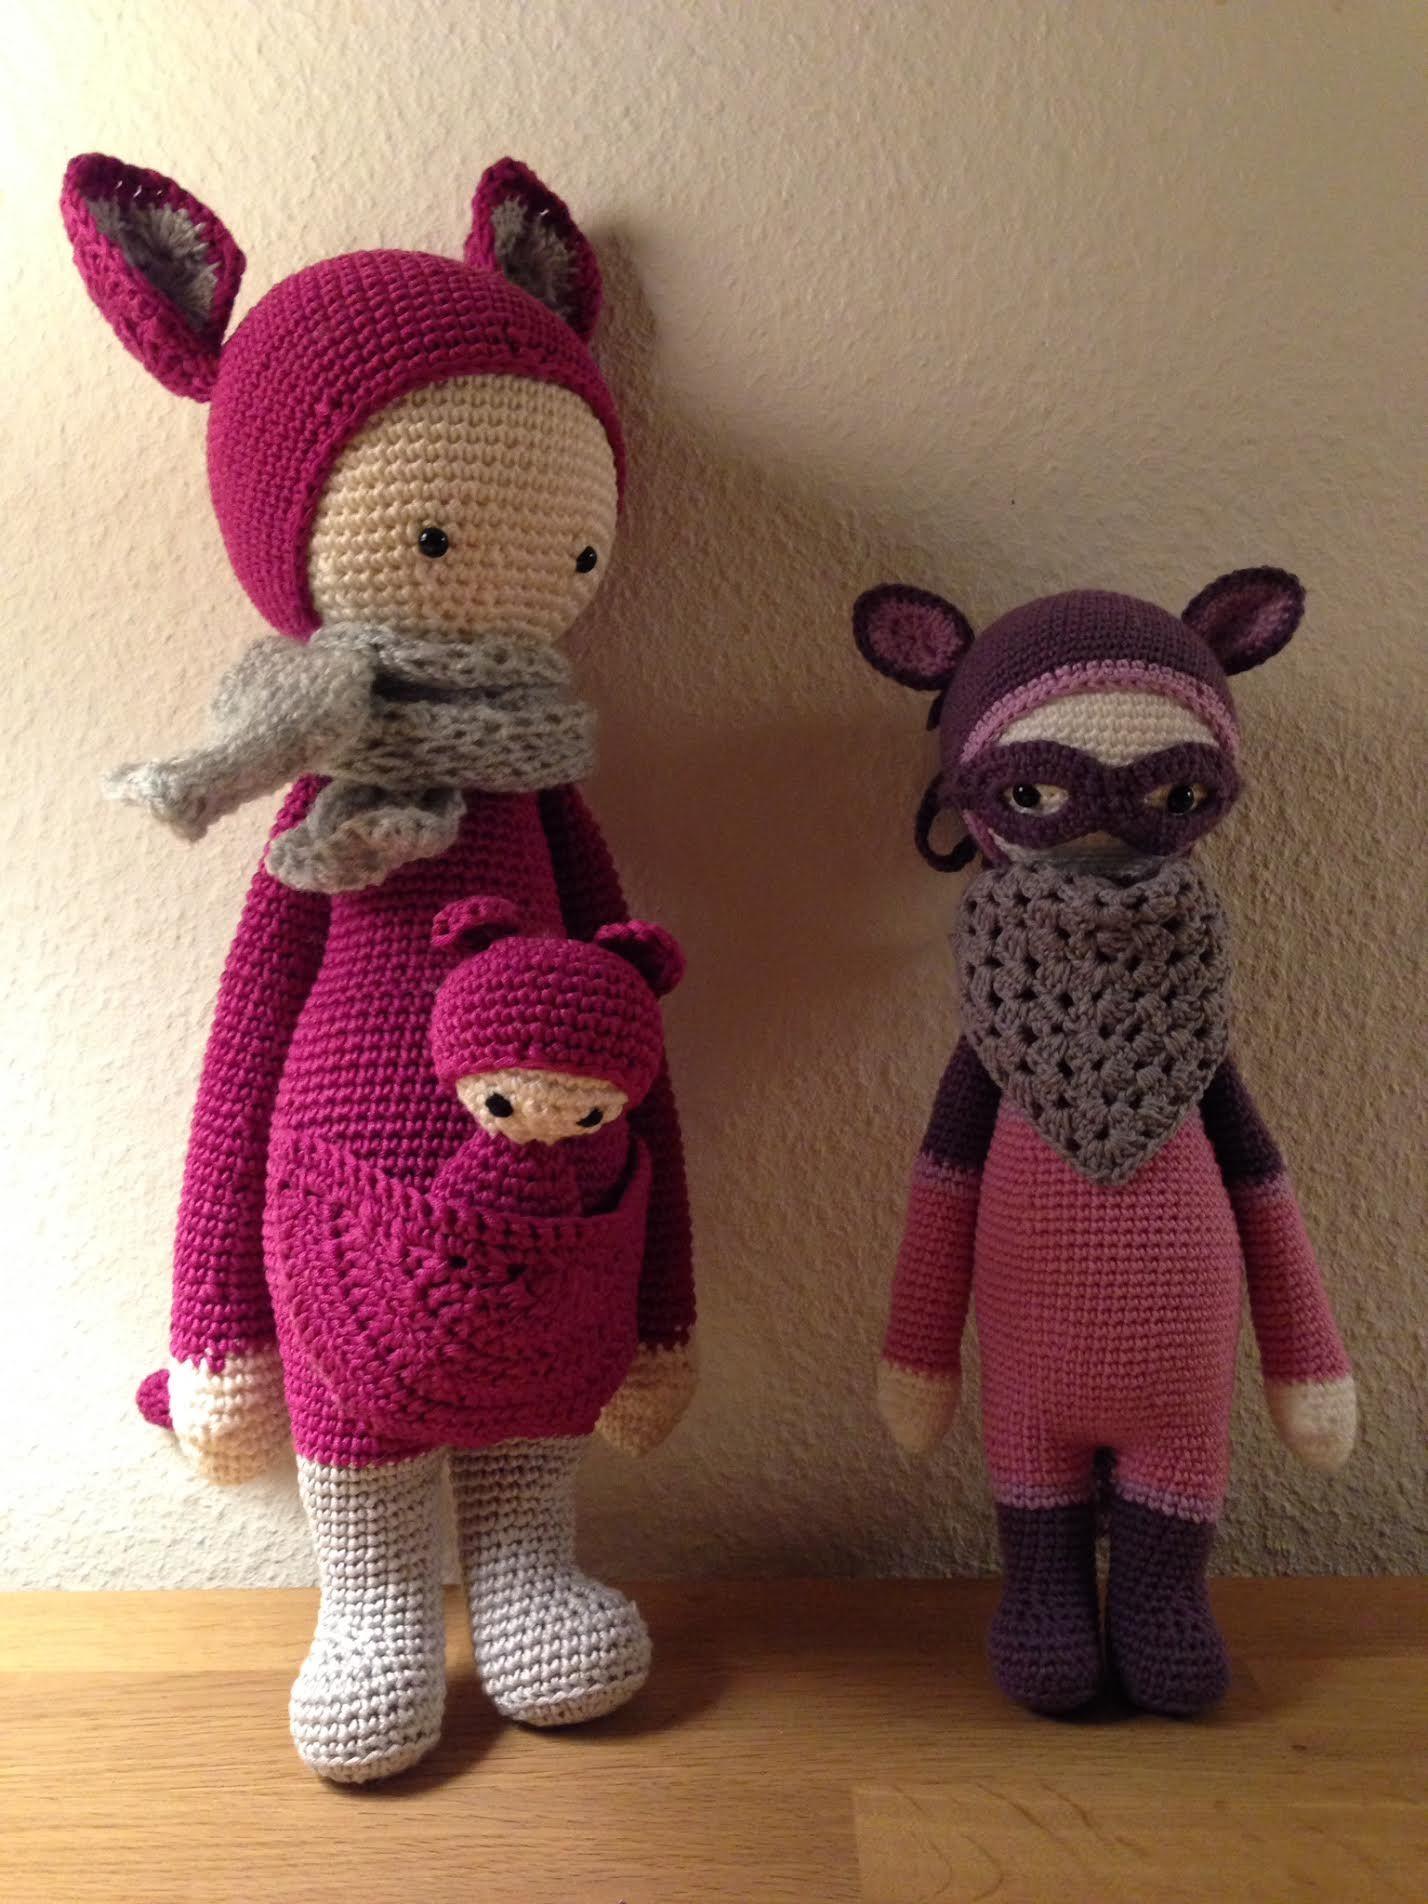 KIRA the kangaroo and ROCO the raccoon made by Bettina V. / crochet patterns by lalylala